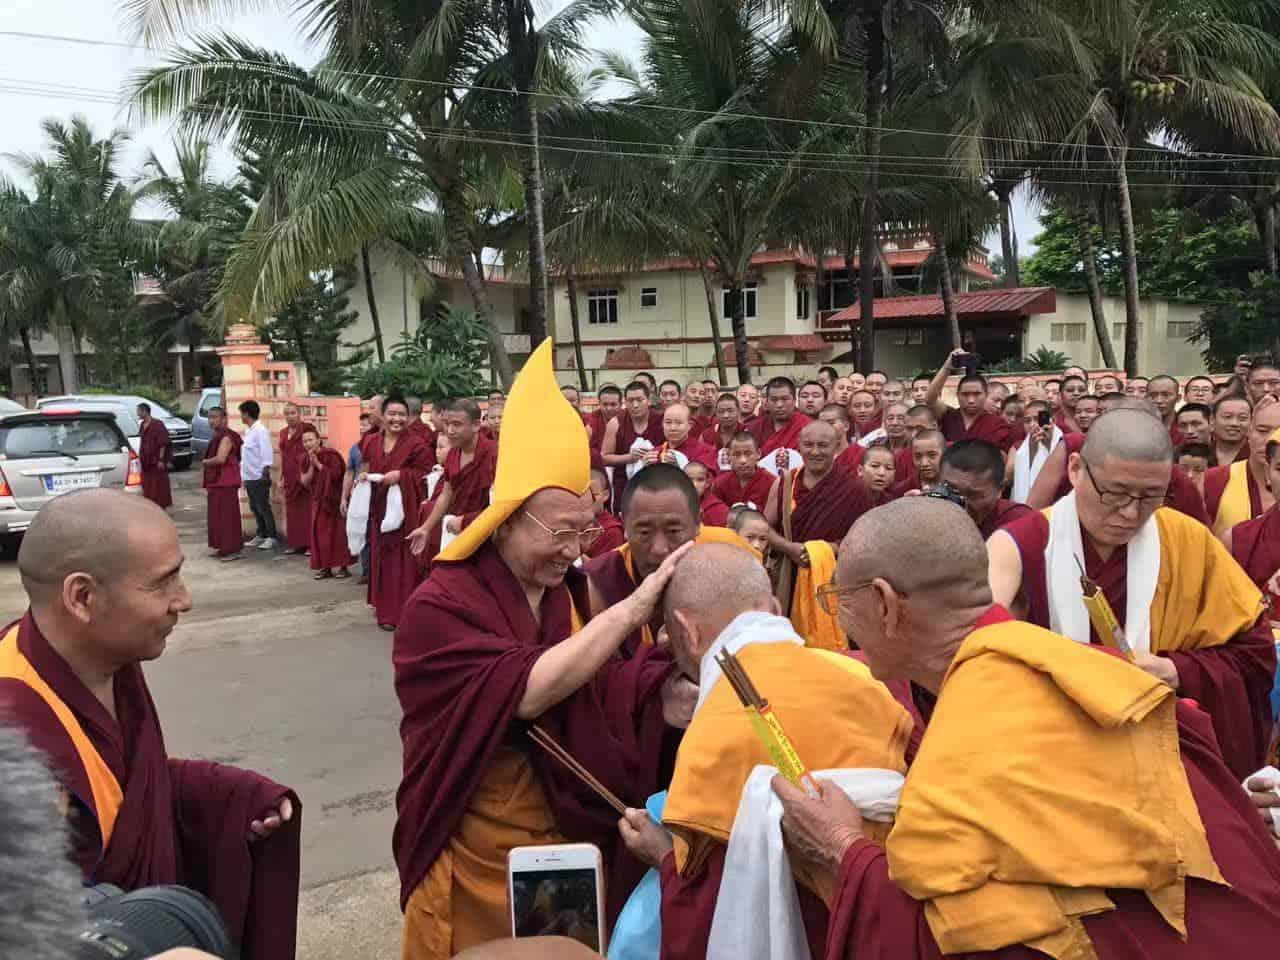 Gosok Rinpoche 20170826020810